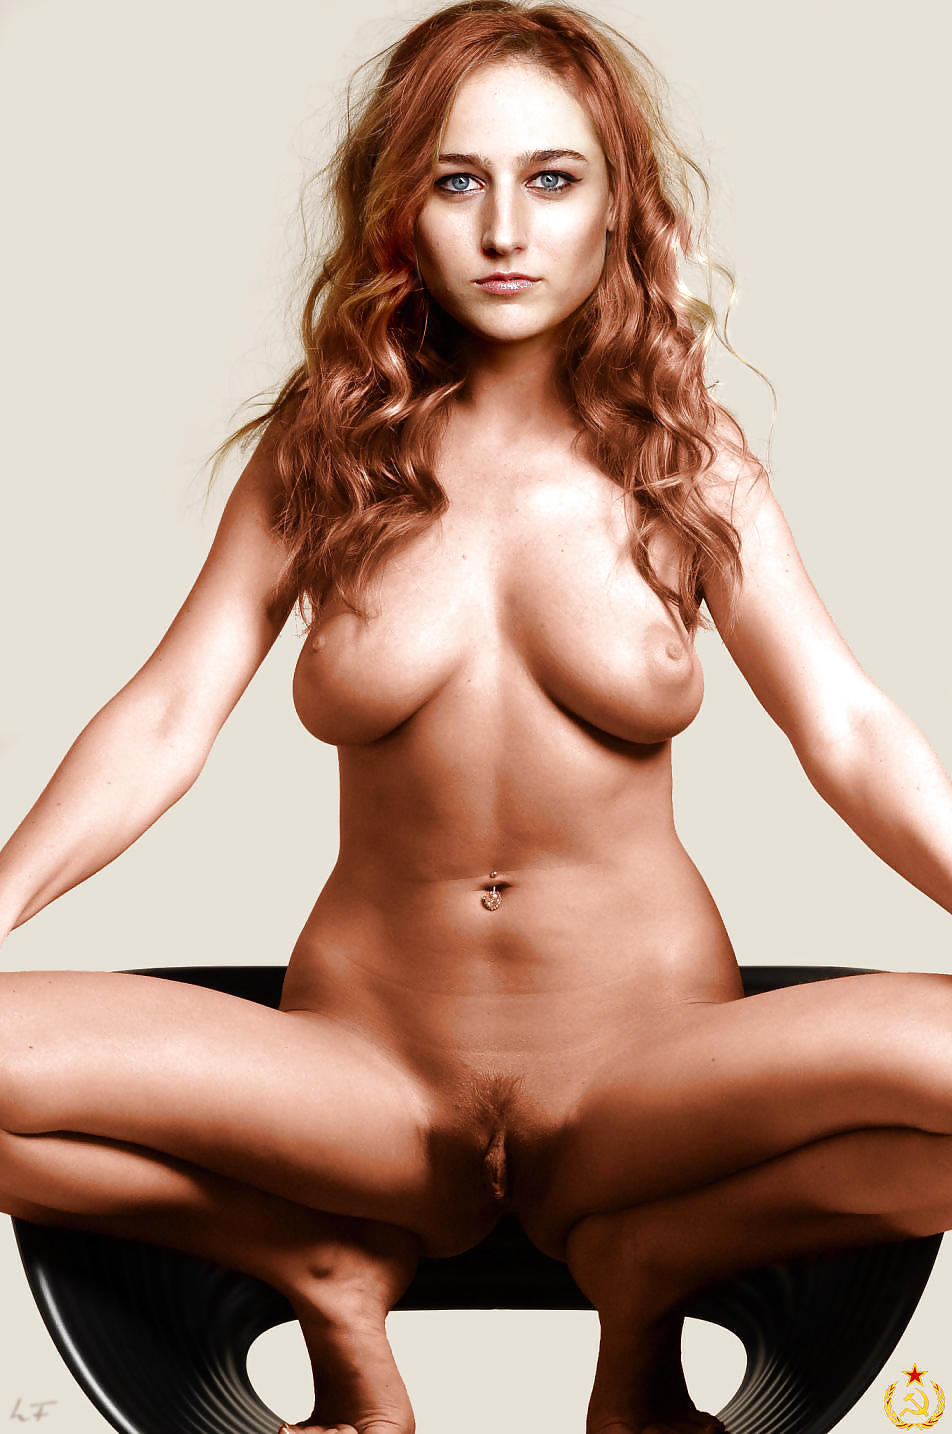 Leelee sobieski finding bliss nude